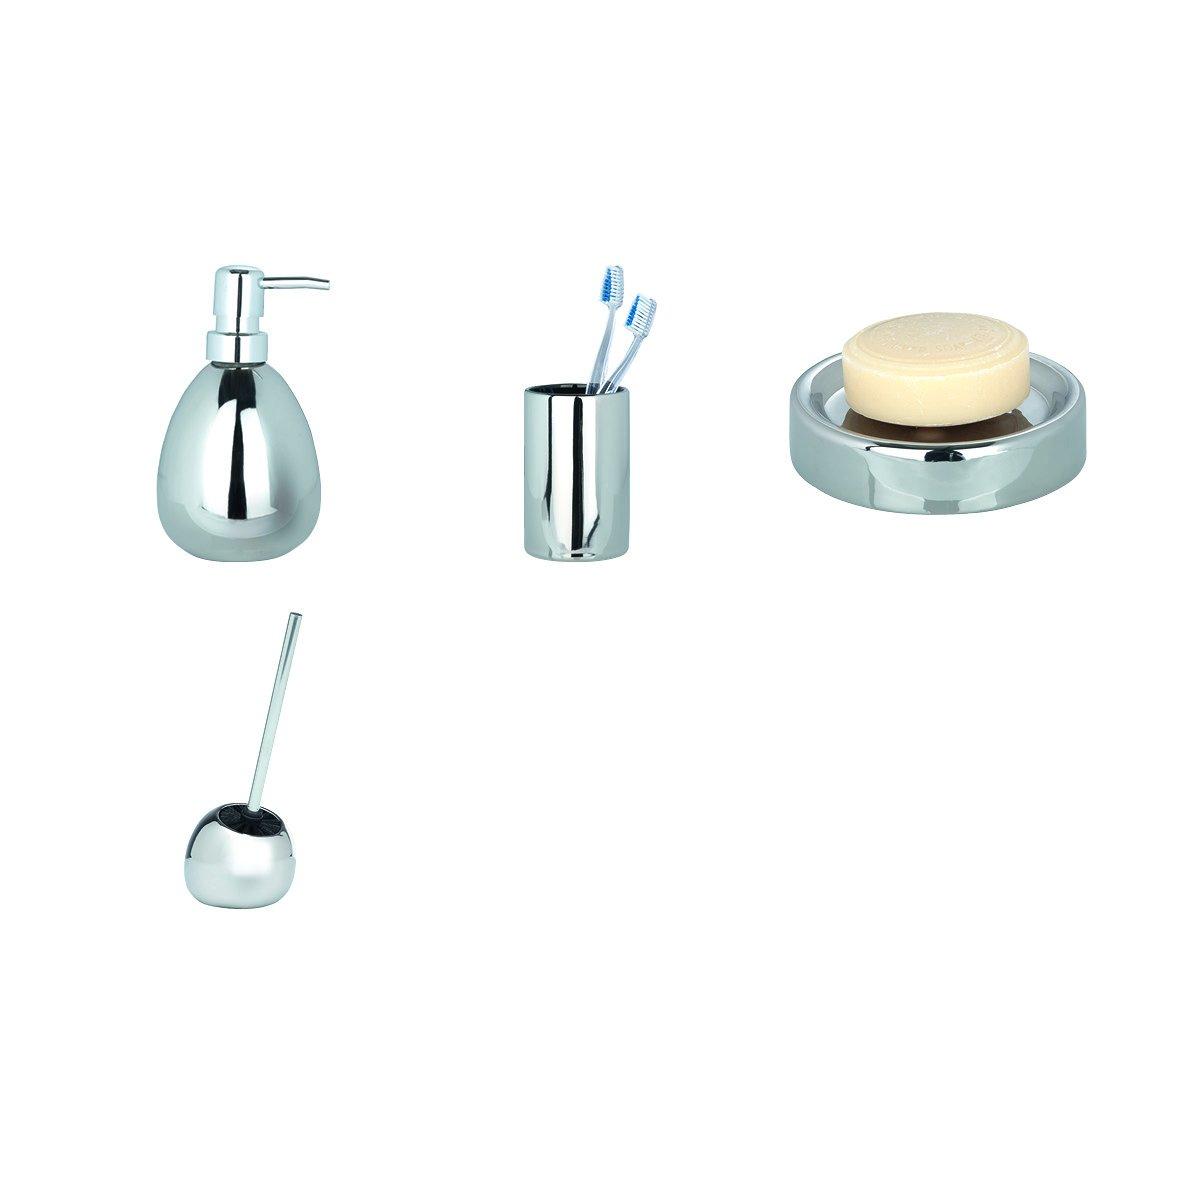 WENKO 20389100 WC-Garnitur Polaris Grey WC-B/ürstenhalter 15 x 34.5 x 14.5 cm Keramik Grau